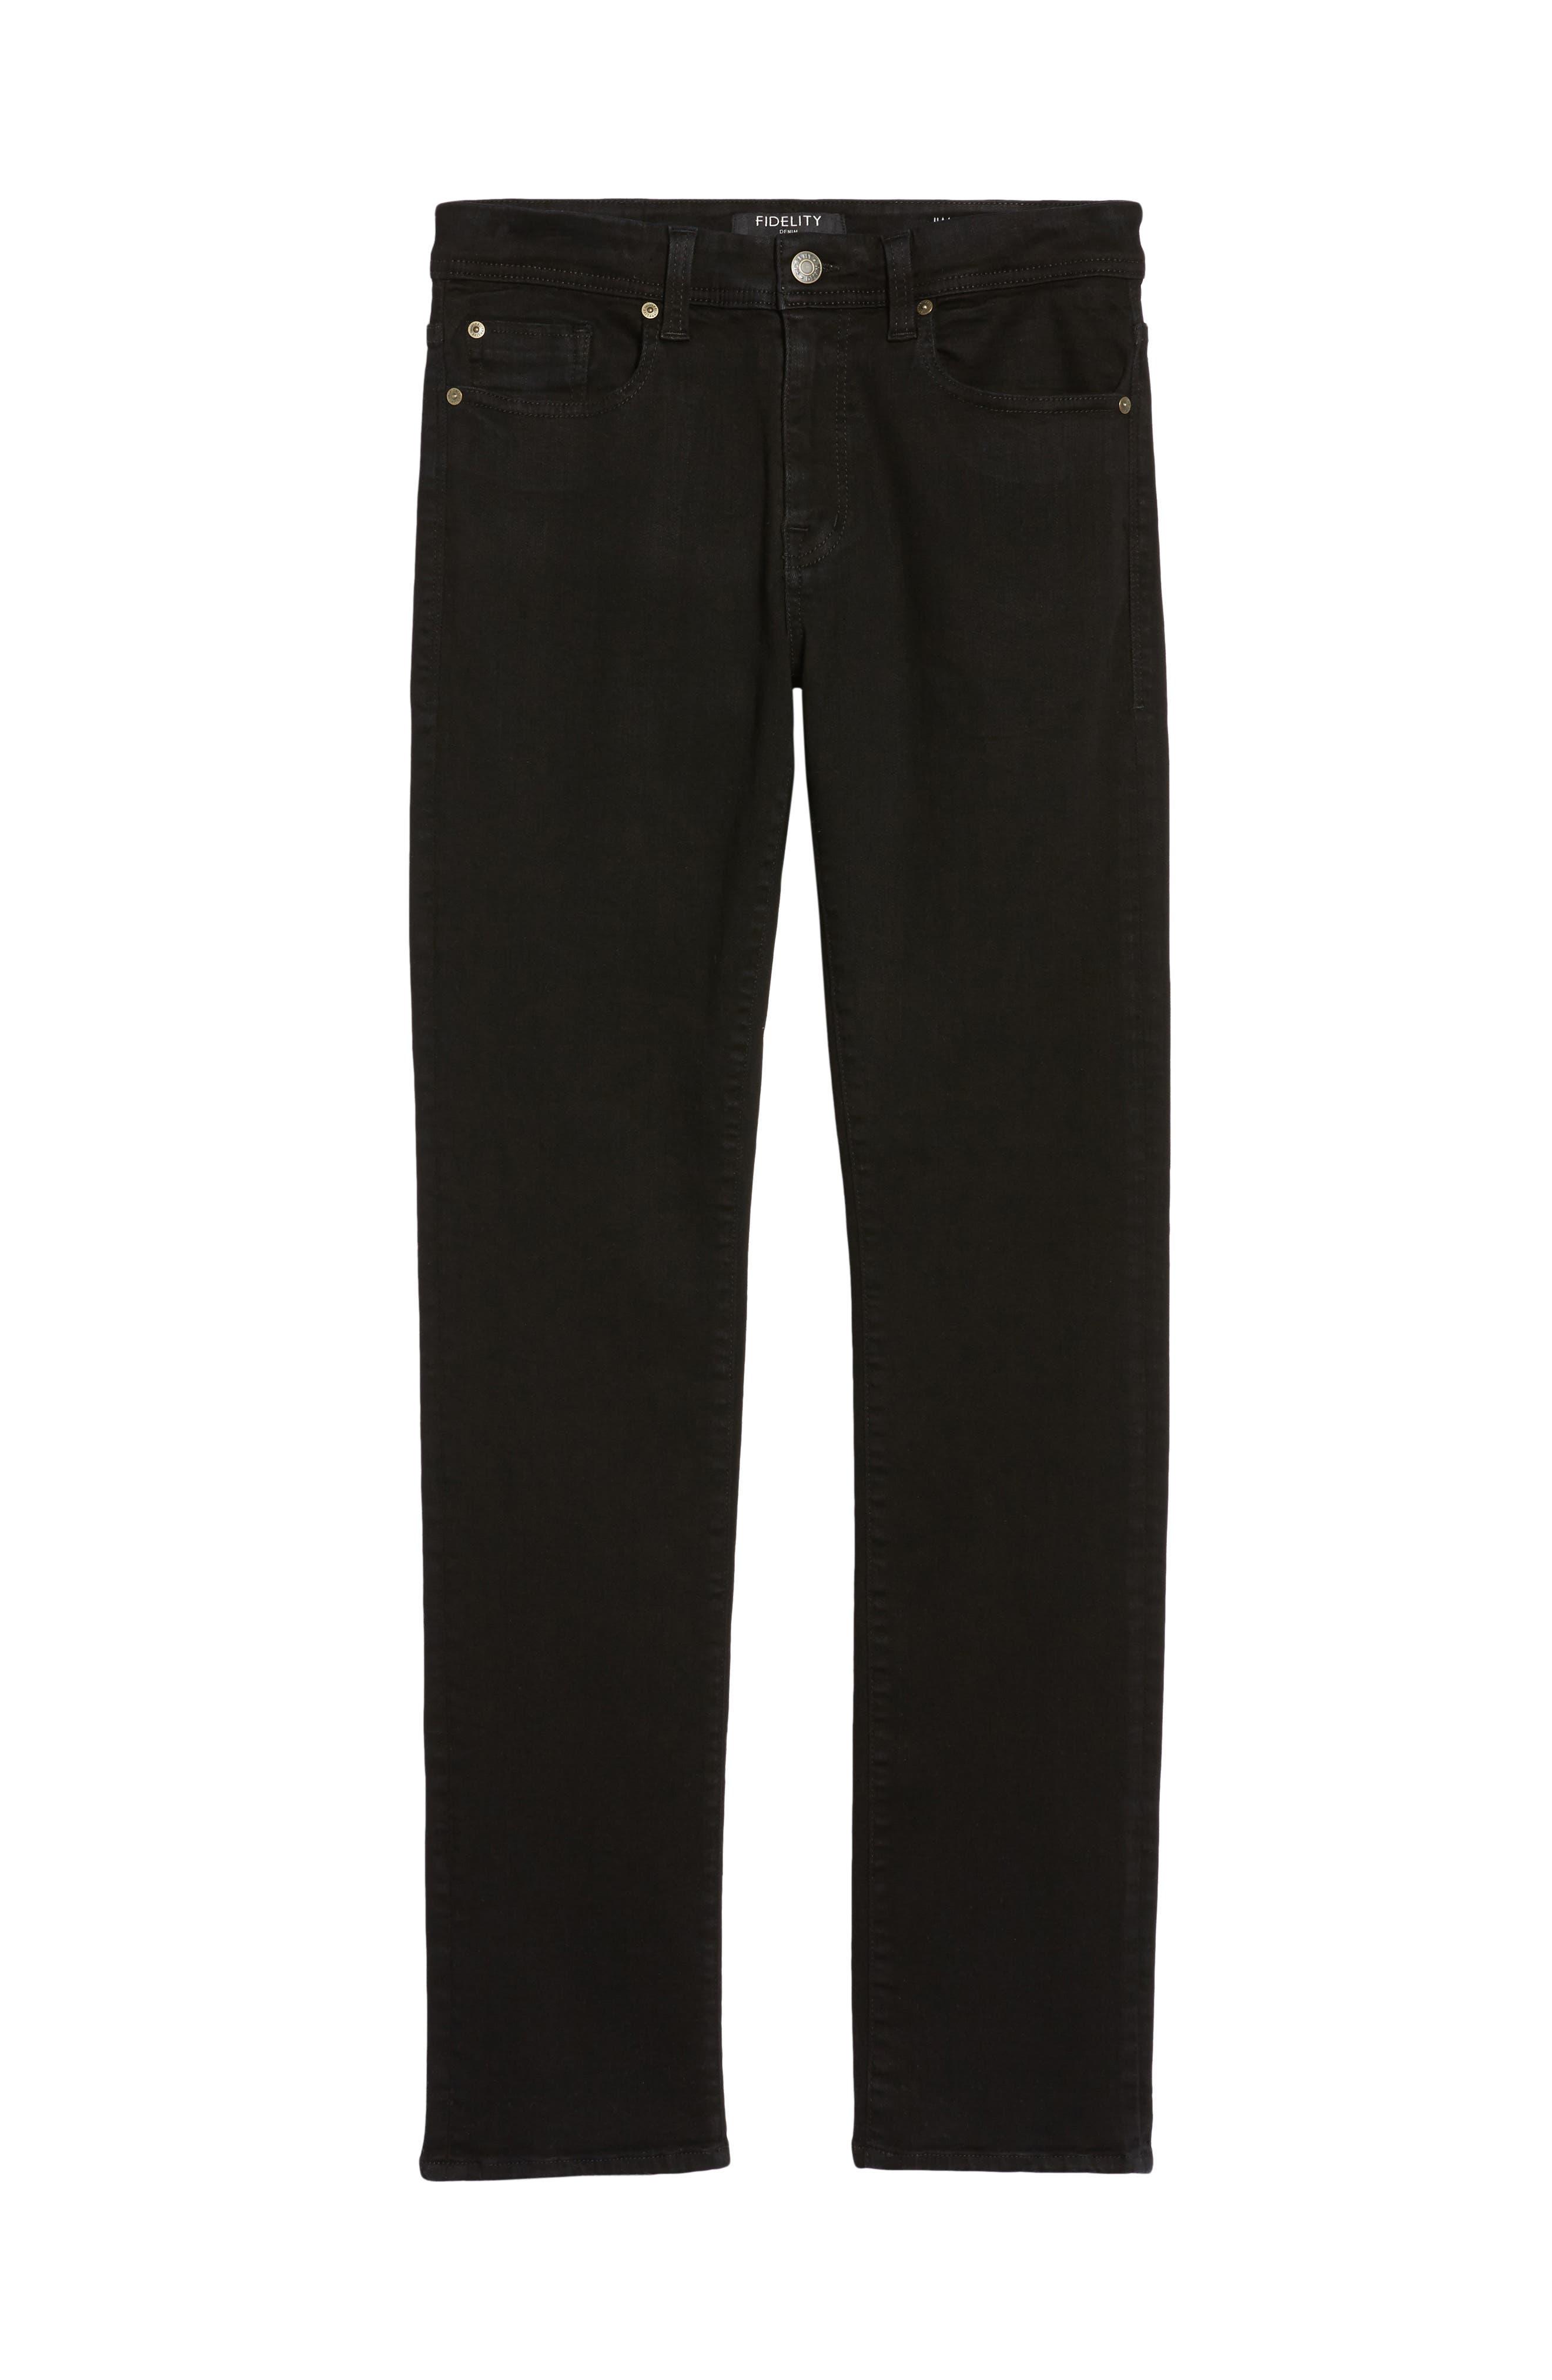 Jimmy Slim Straight leg Jeans,                         Main,                         color, Everblack